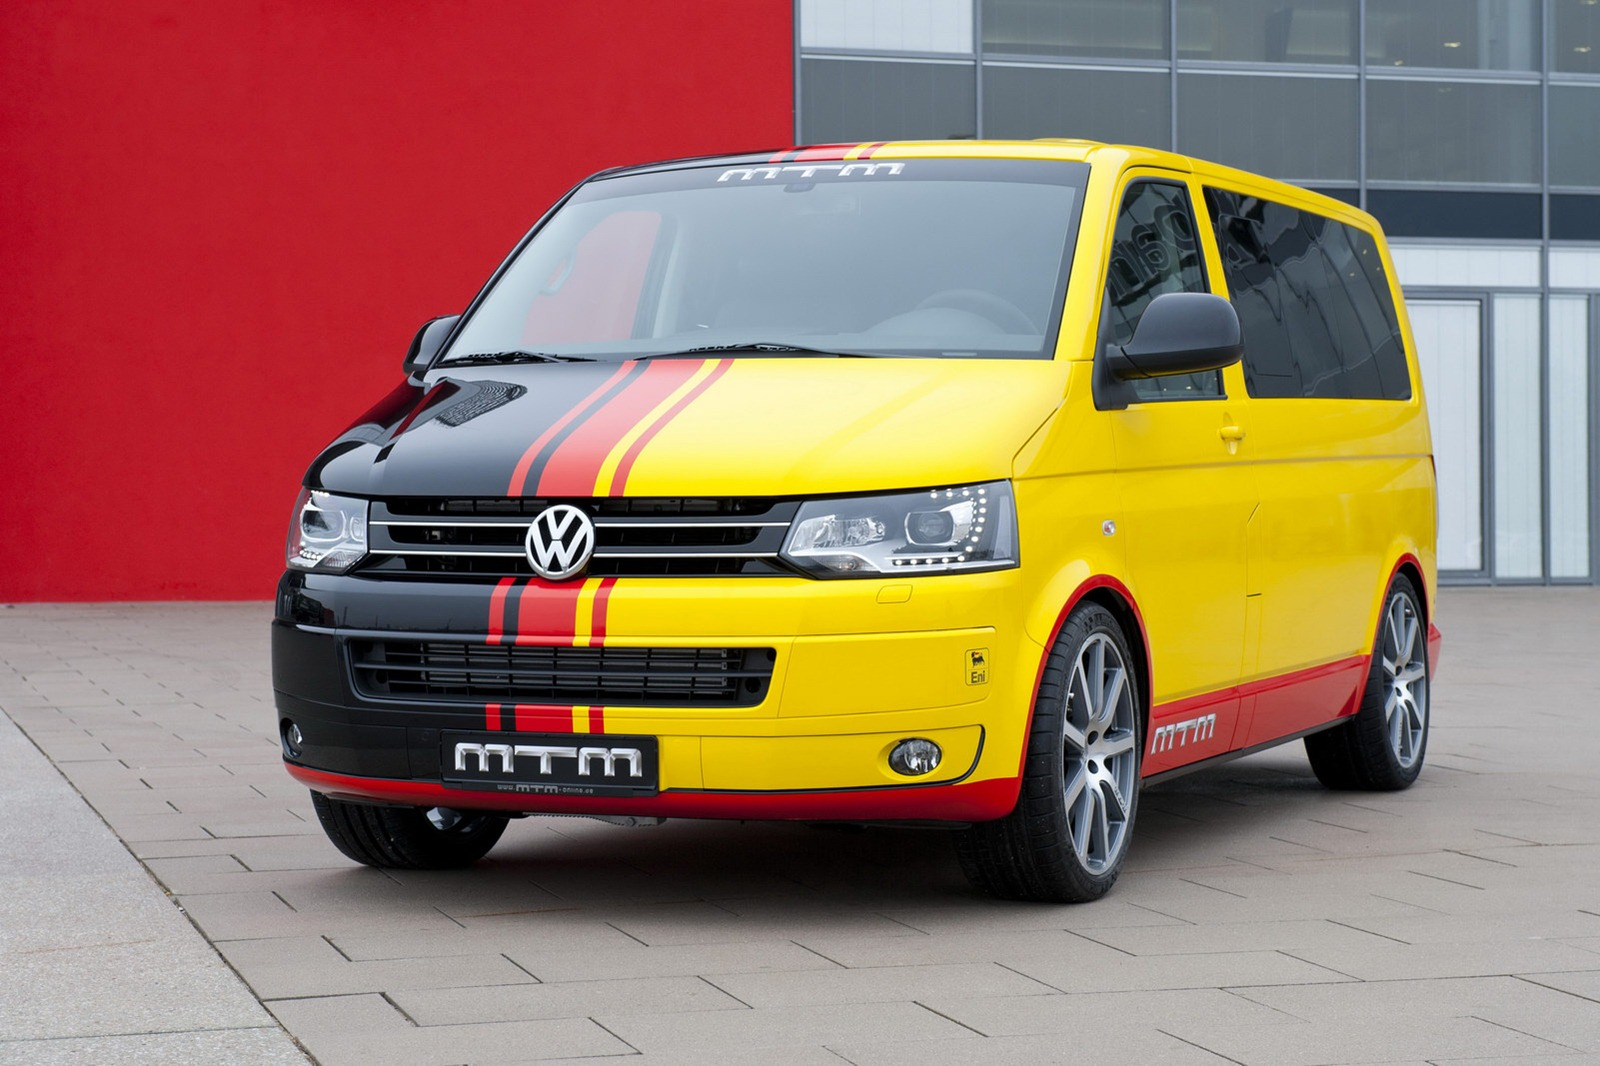 mtm volkswagen t5 van delivers 472 hp autoevolution. Black Bedroom Furniture Sets. Home Design Ideas